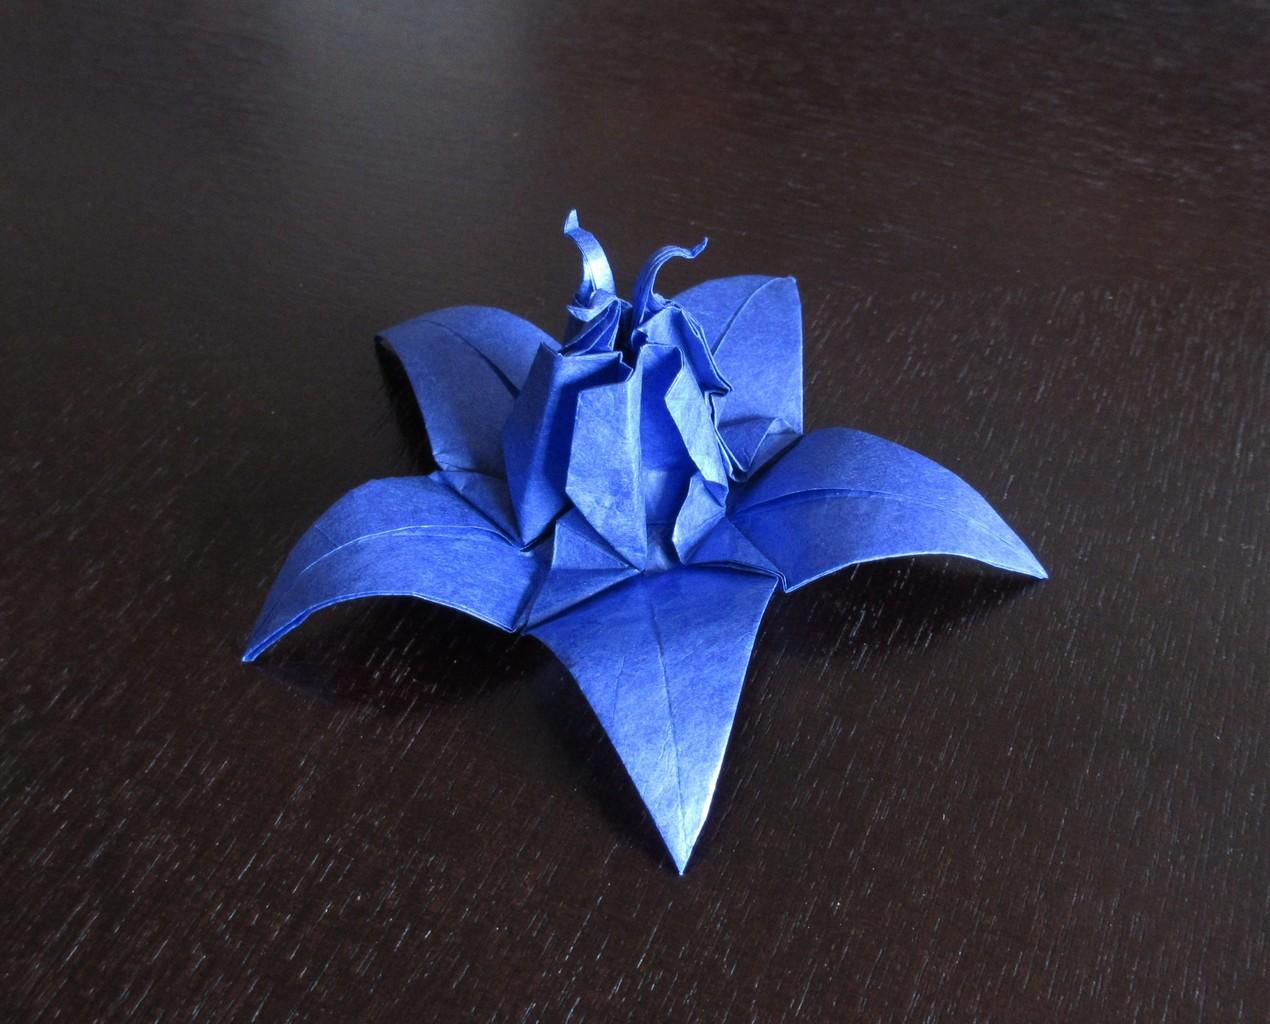 124333 Artistcahoonas Craft Flower Origami Papercraft Photo